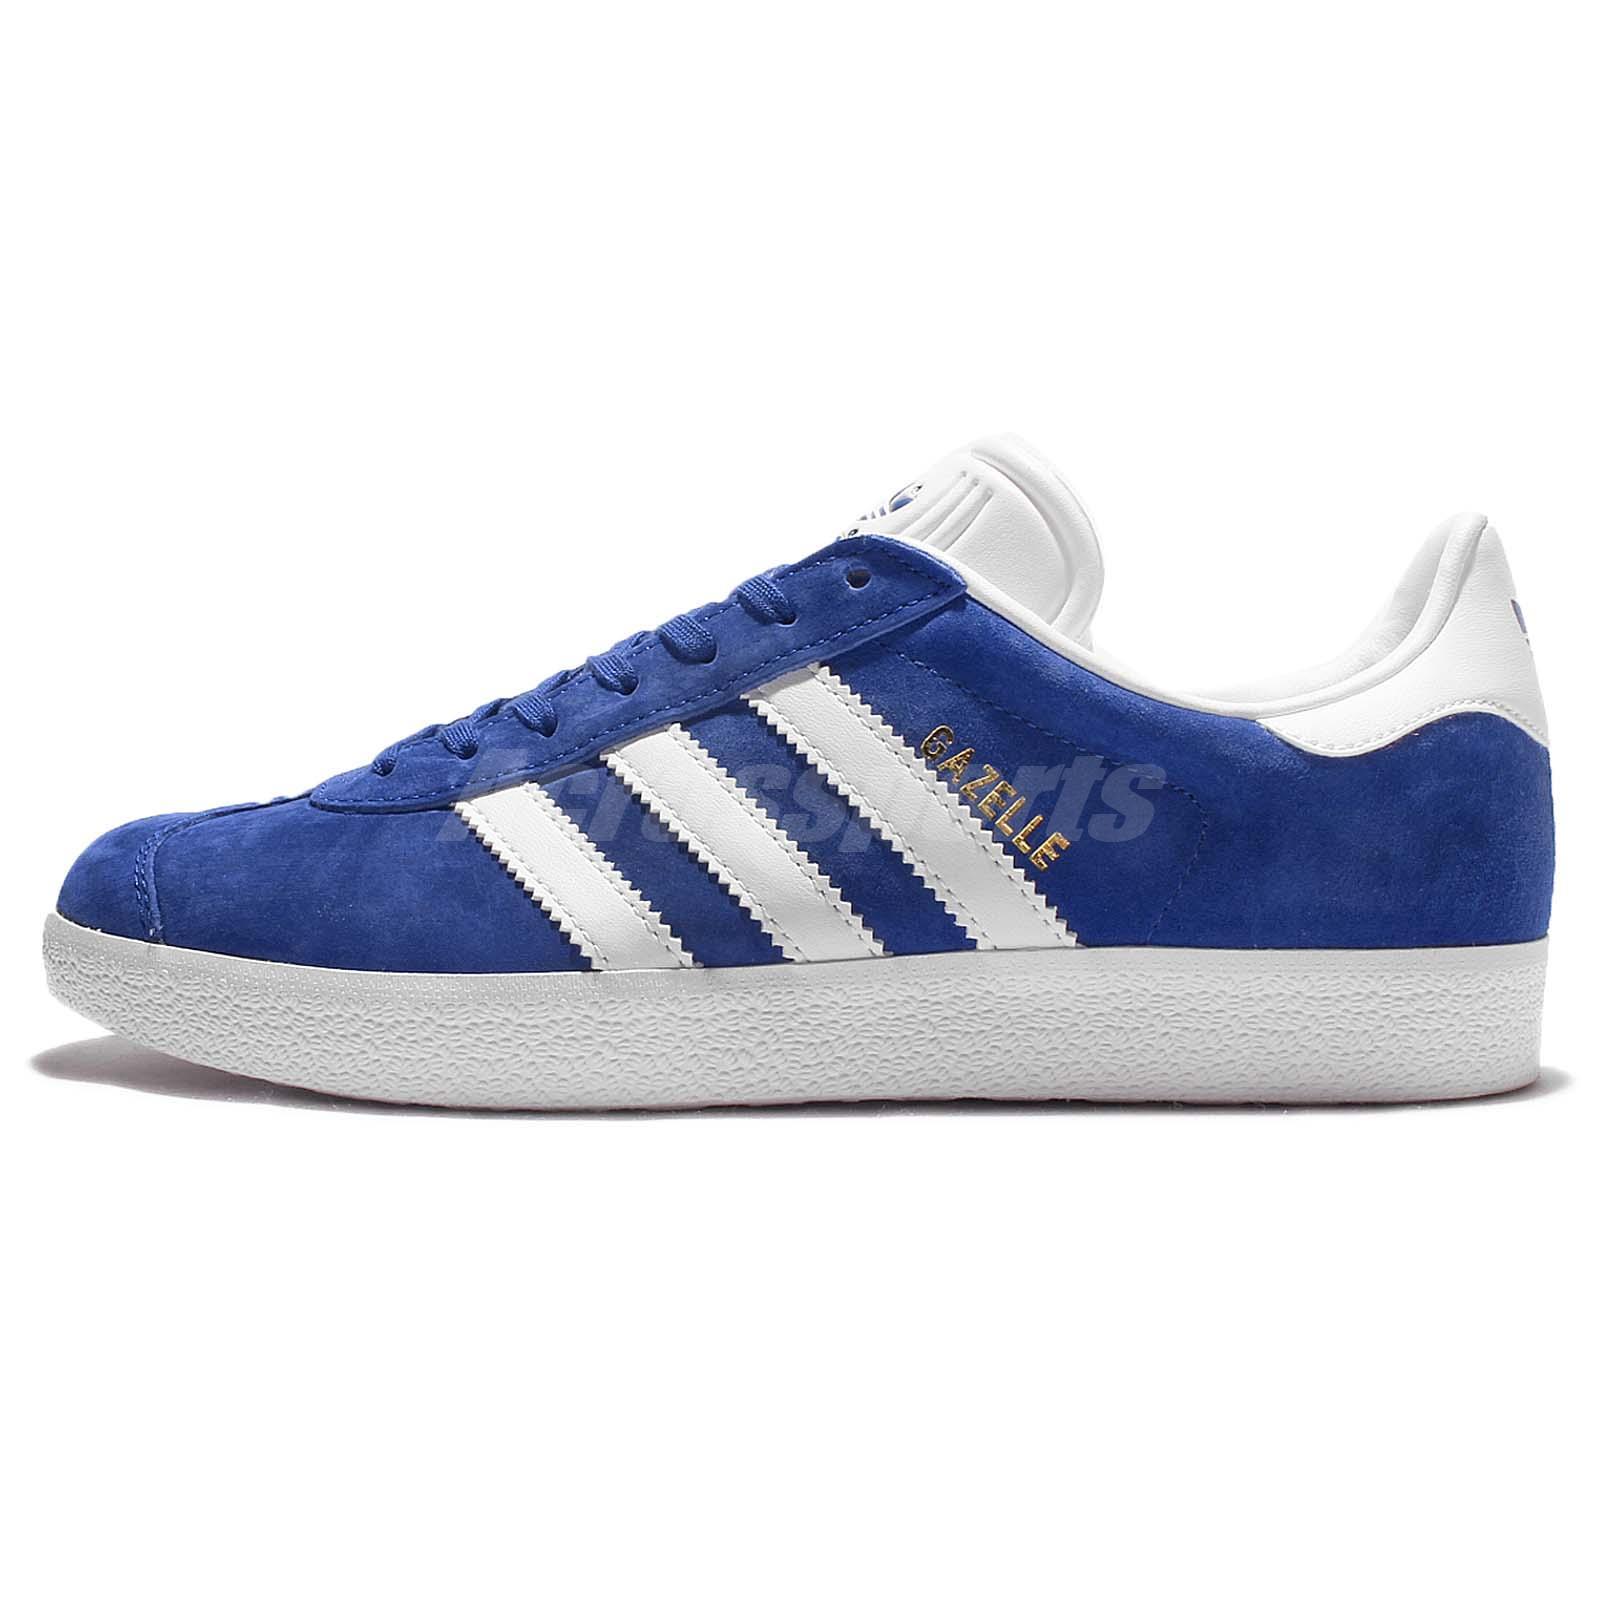 Adidas Mens Gazelle Shoes Amazon